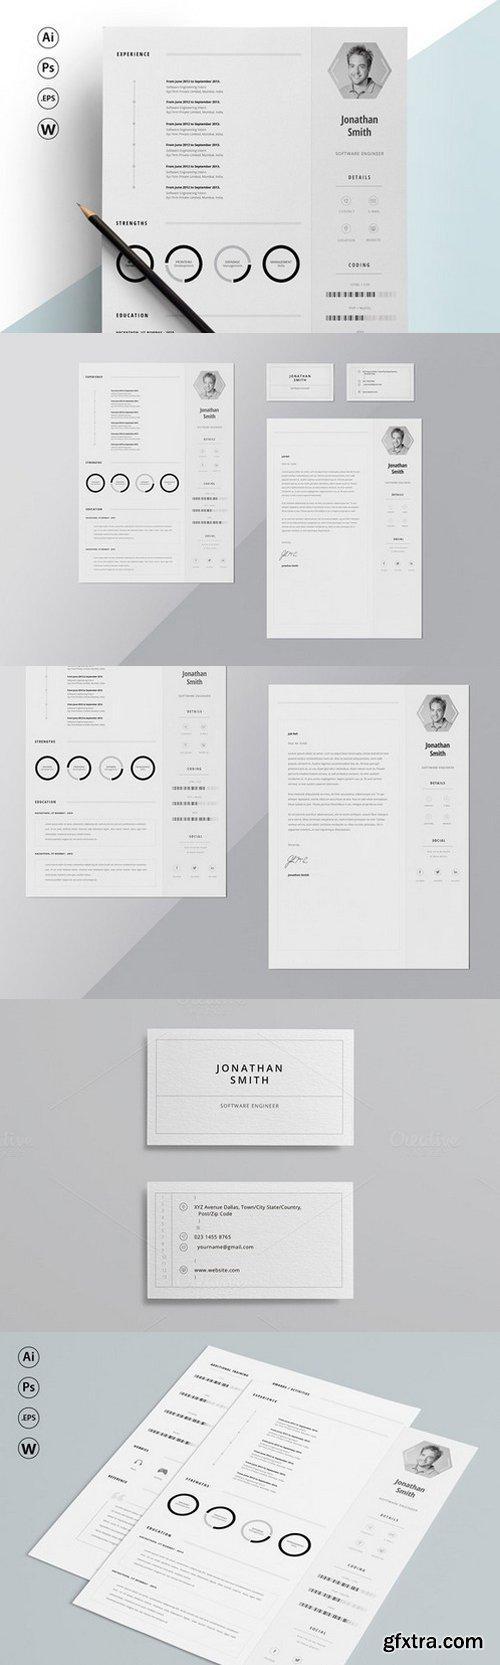 CM - ResumeCV - Elegance + Bcard 409367